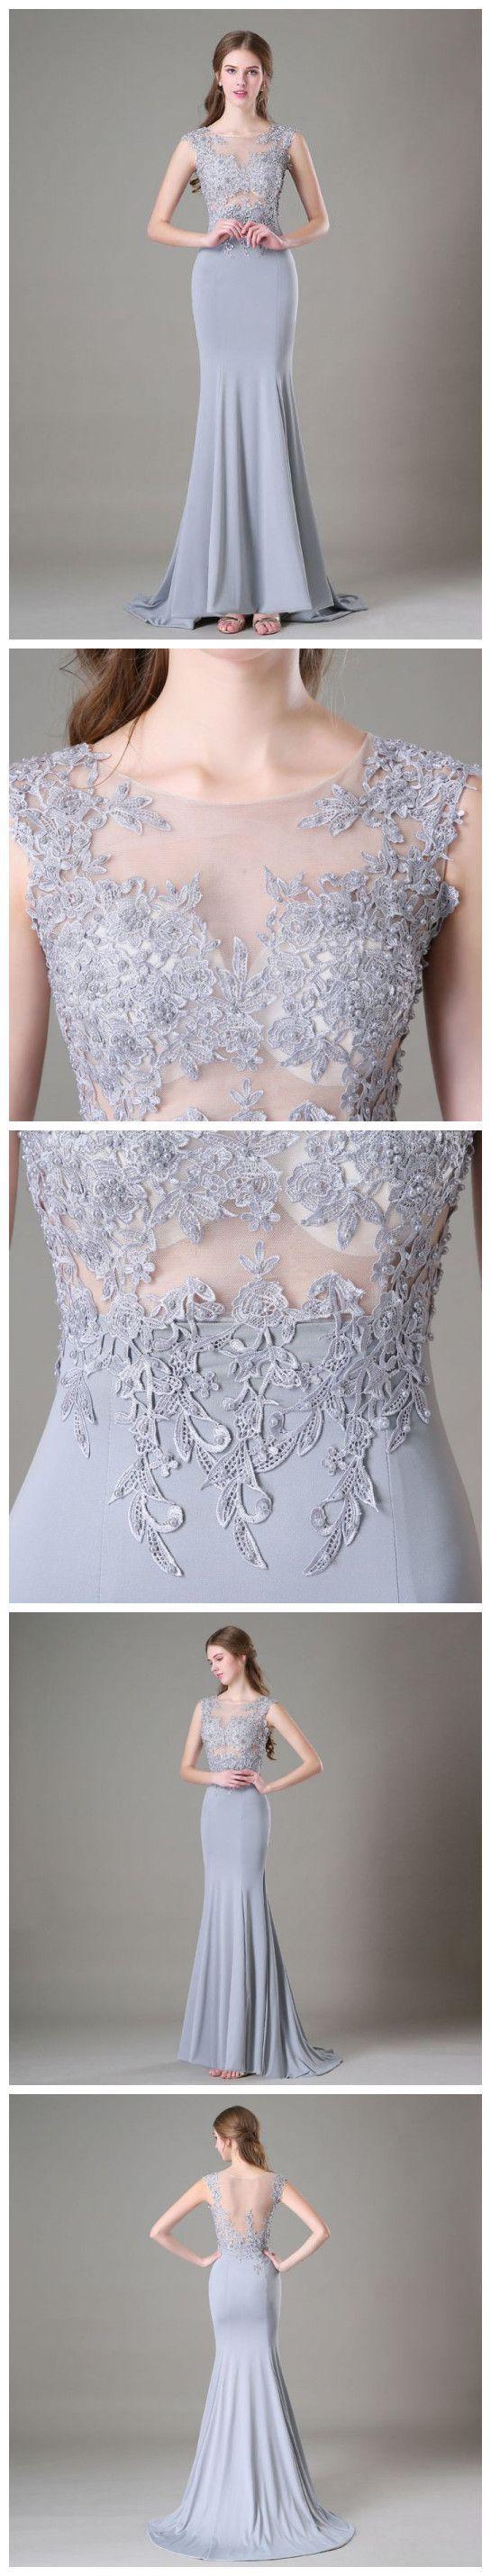 Beading Lace Prom Dress,Long Prom Dresses,Prom Dresses,Evening Dress, Evening